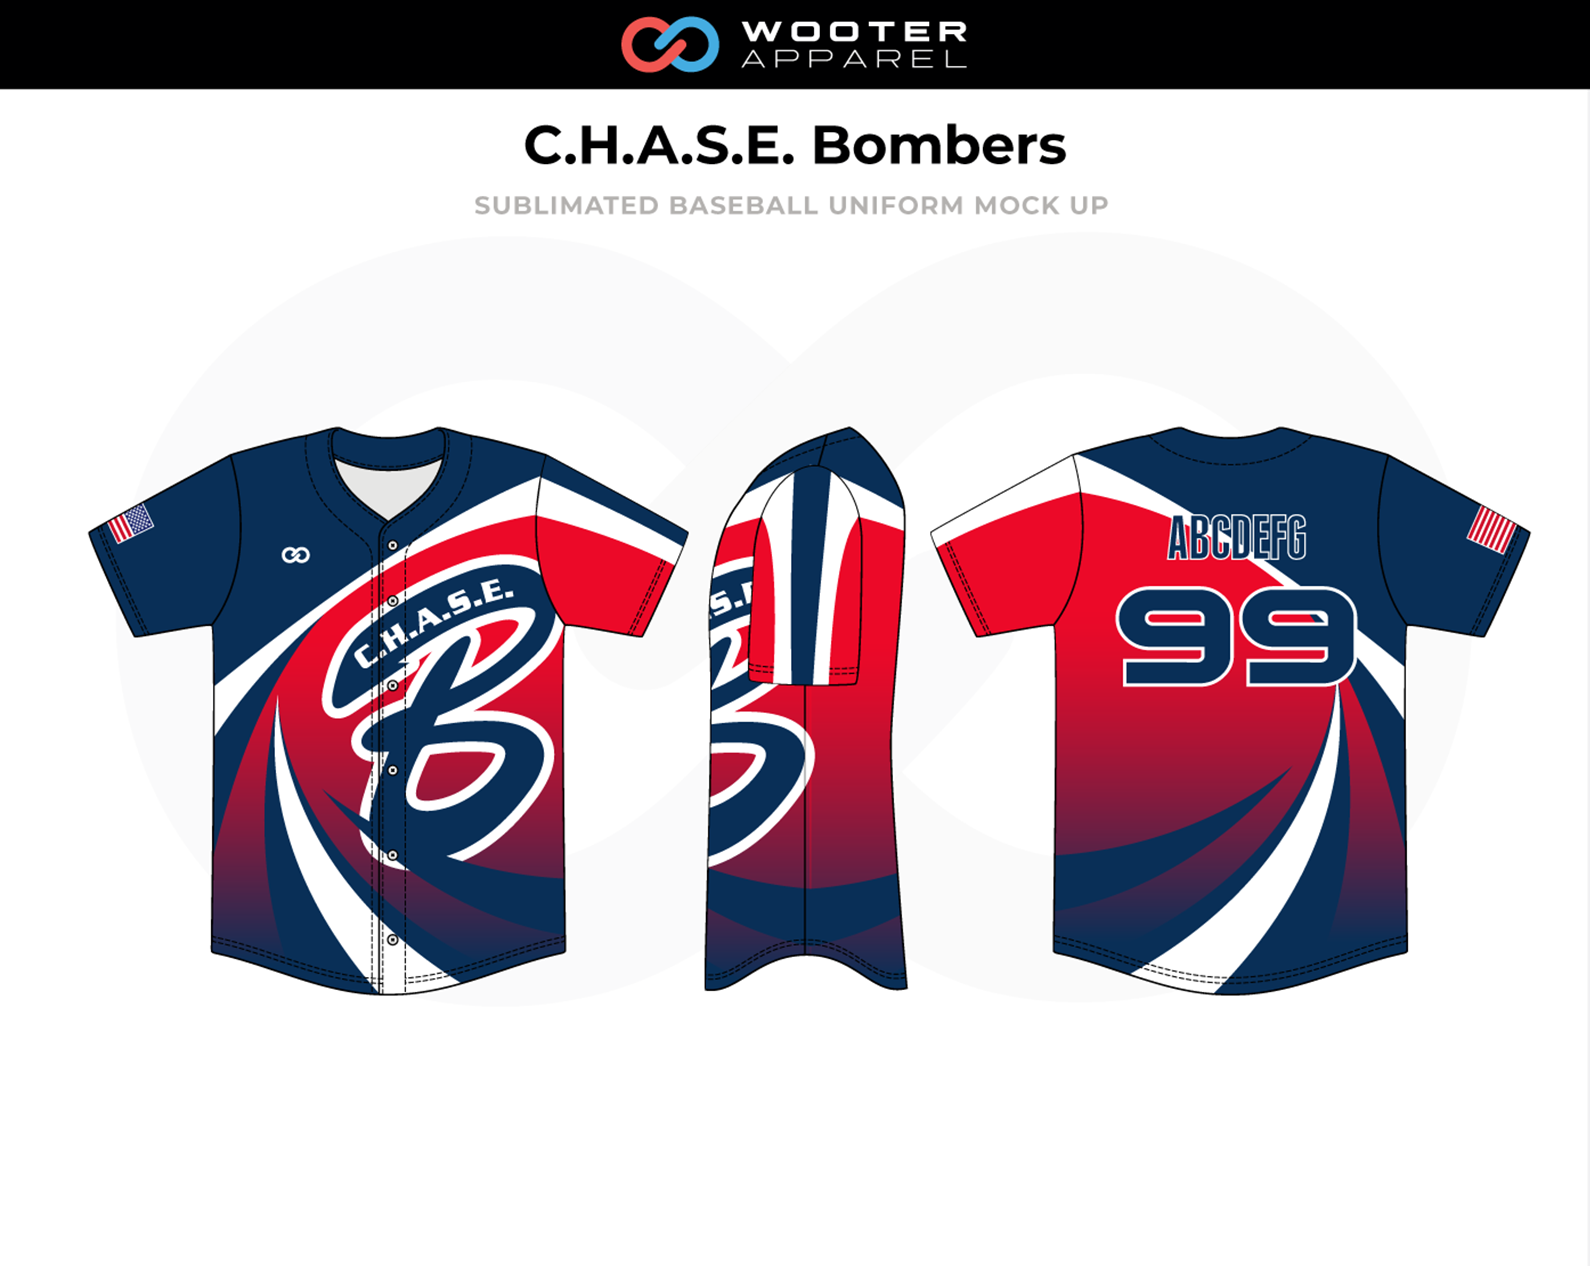 C.H.A.S.E.-Bombers-Sublimated-Baseball-Uniform_v3_2018.png